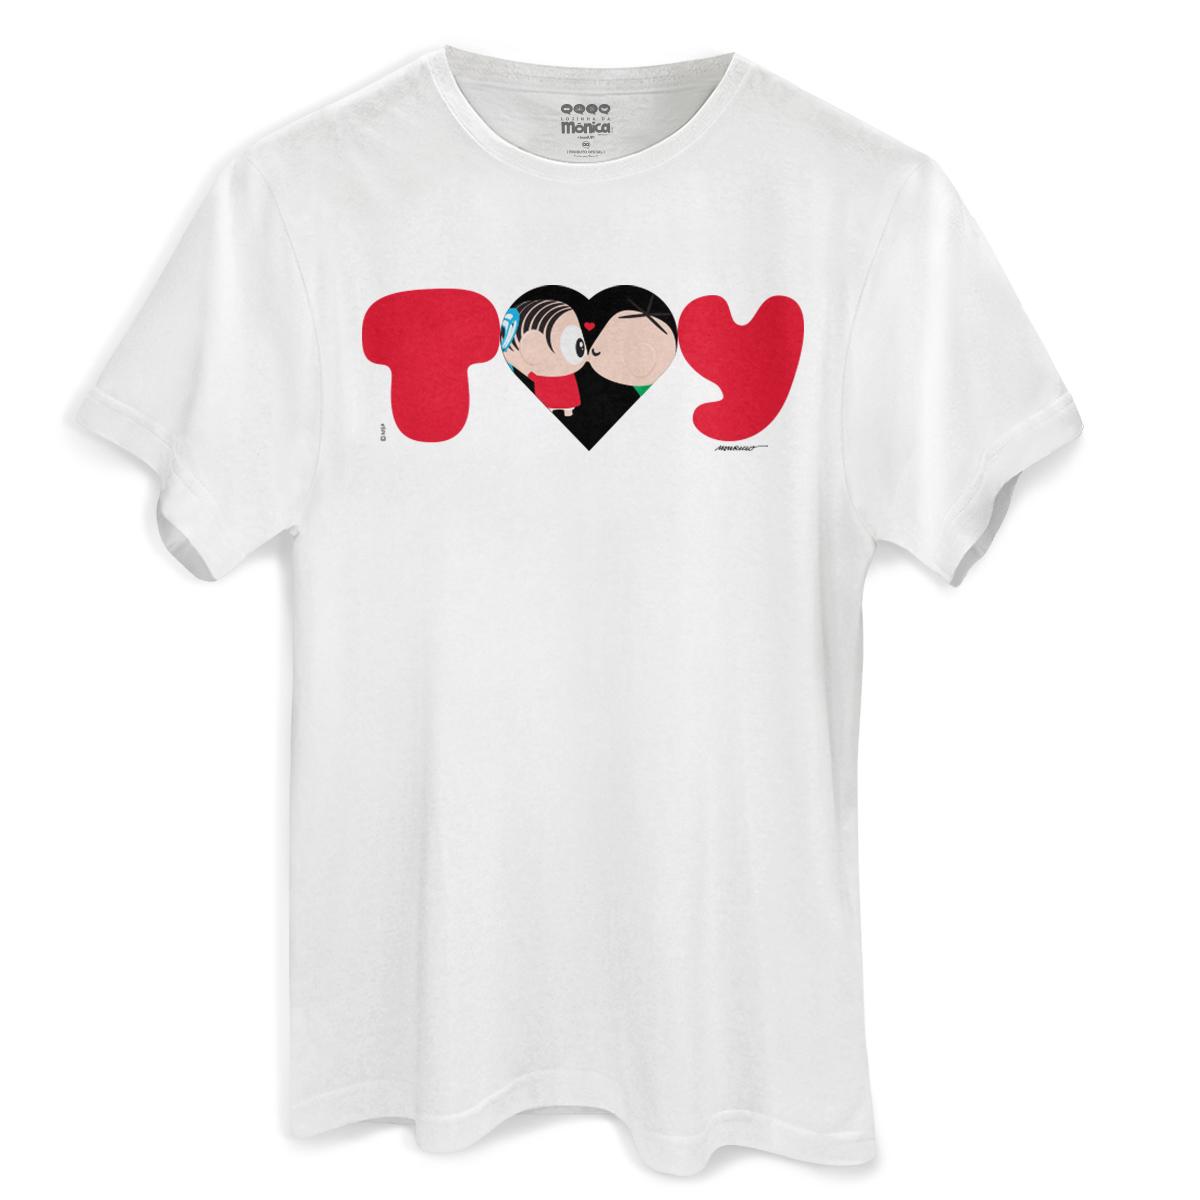 Camiseta Masculina Turma da Mônica Toy Love